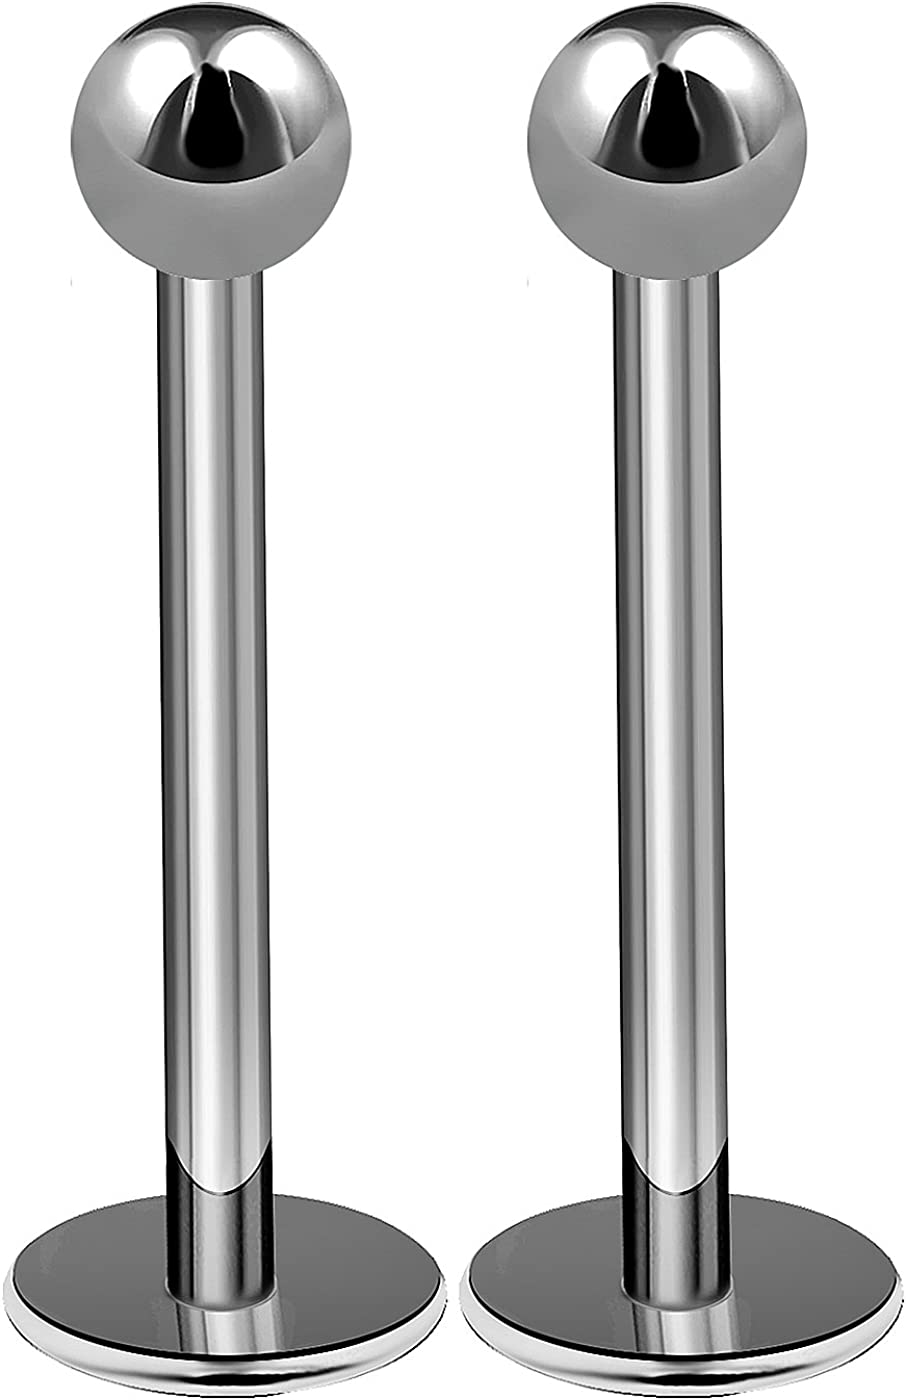 bodyjewellery 2pcs 16g Titanium Labret Studs Conch Piercing Lip